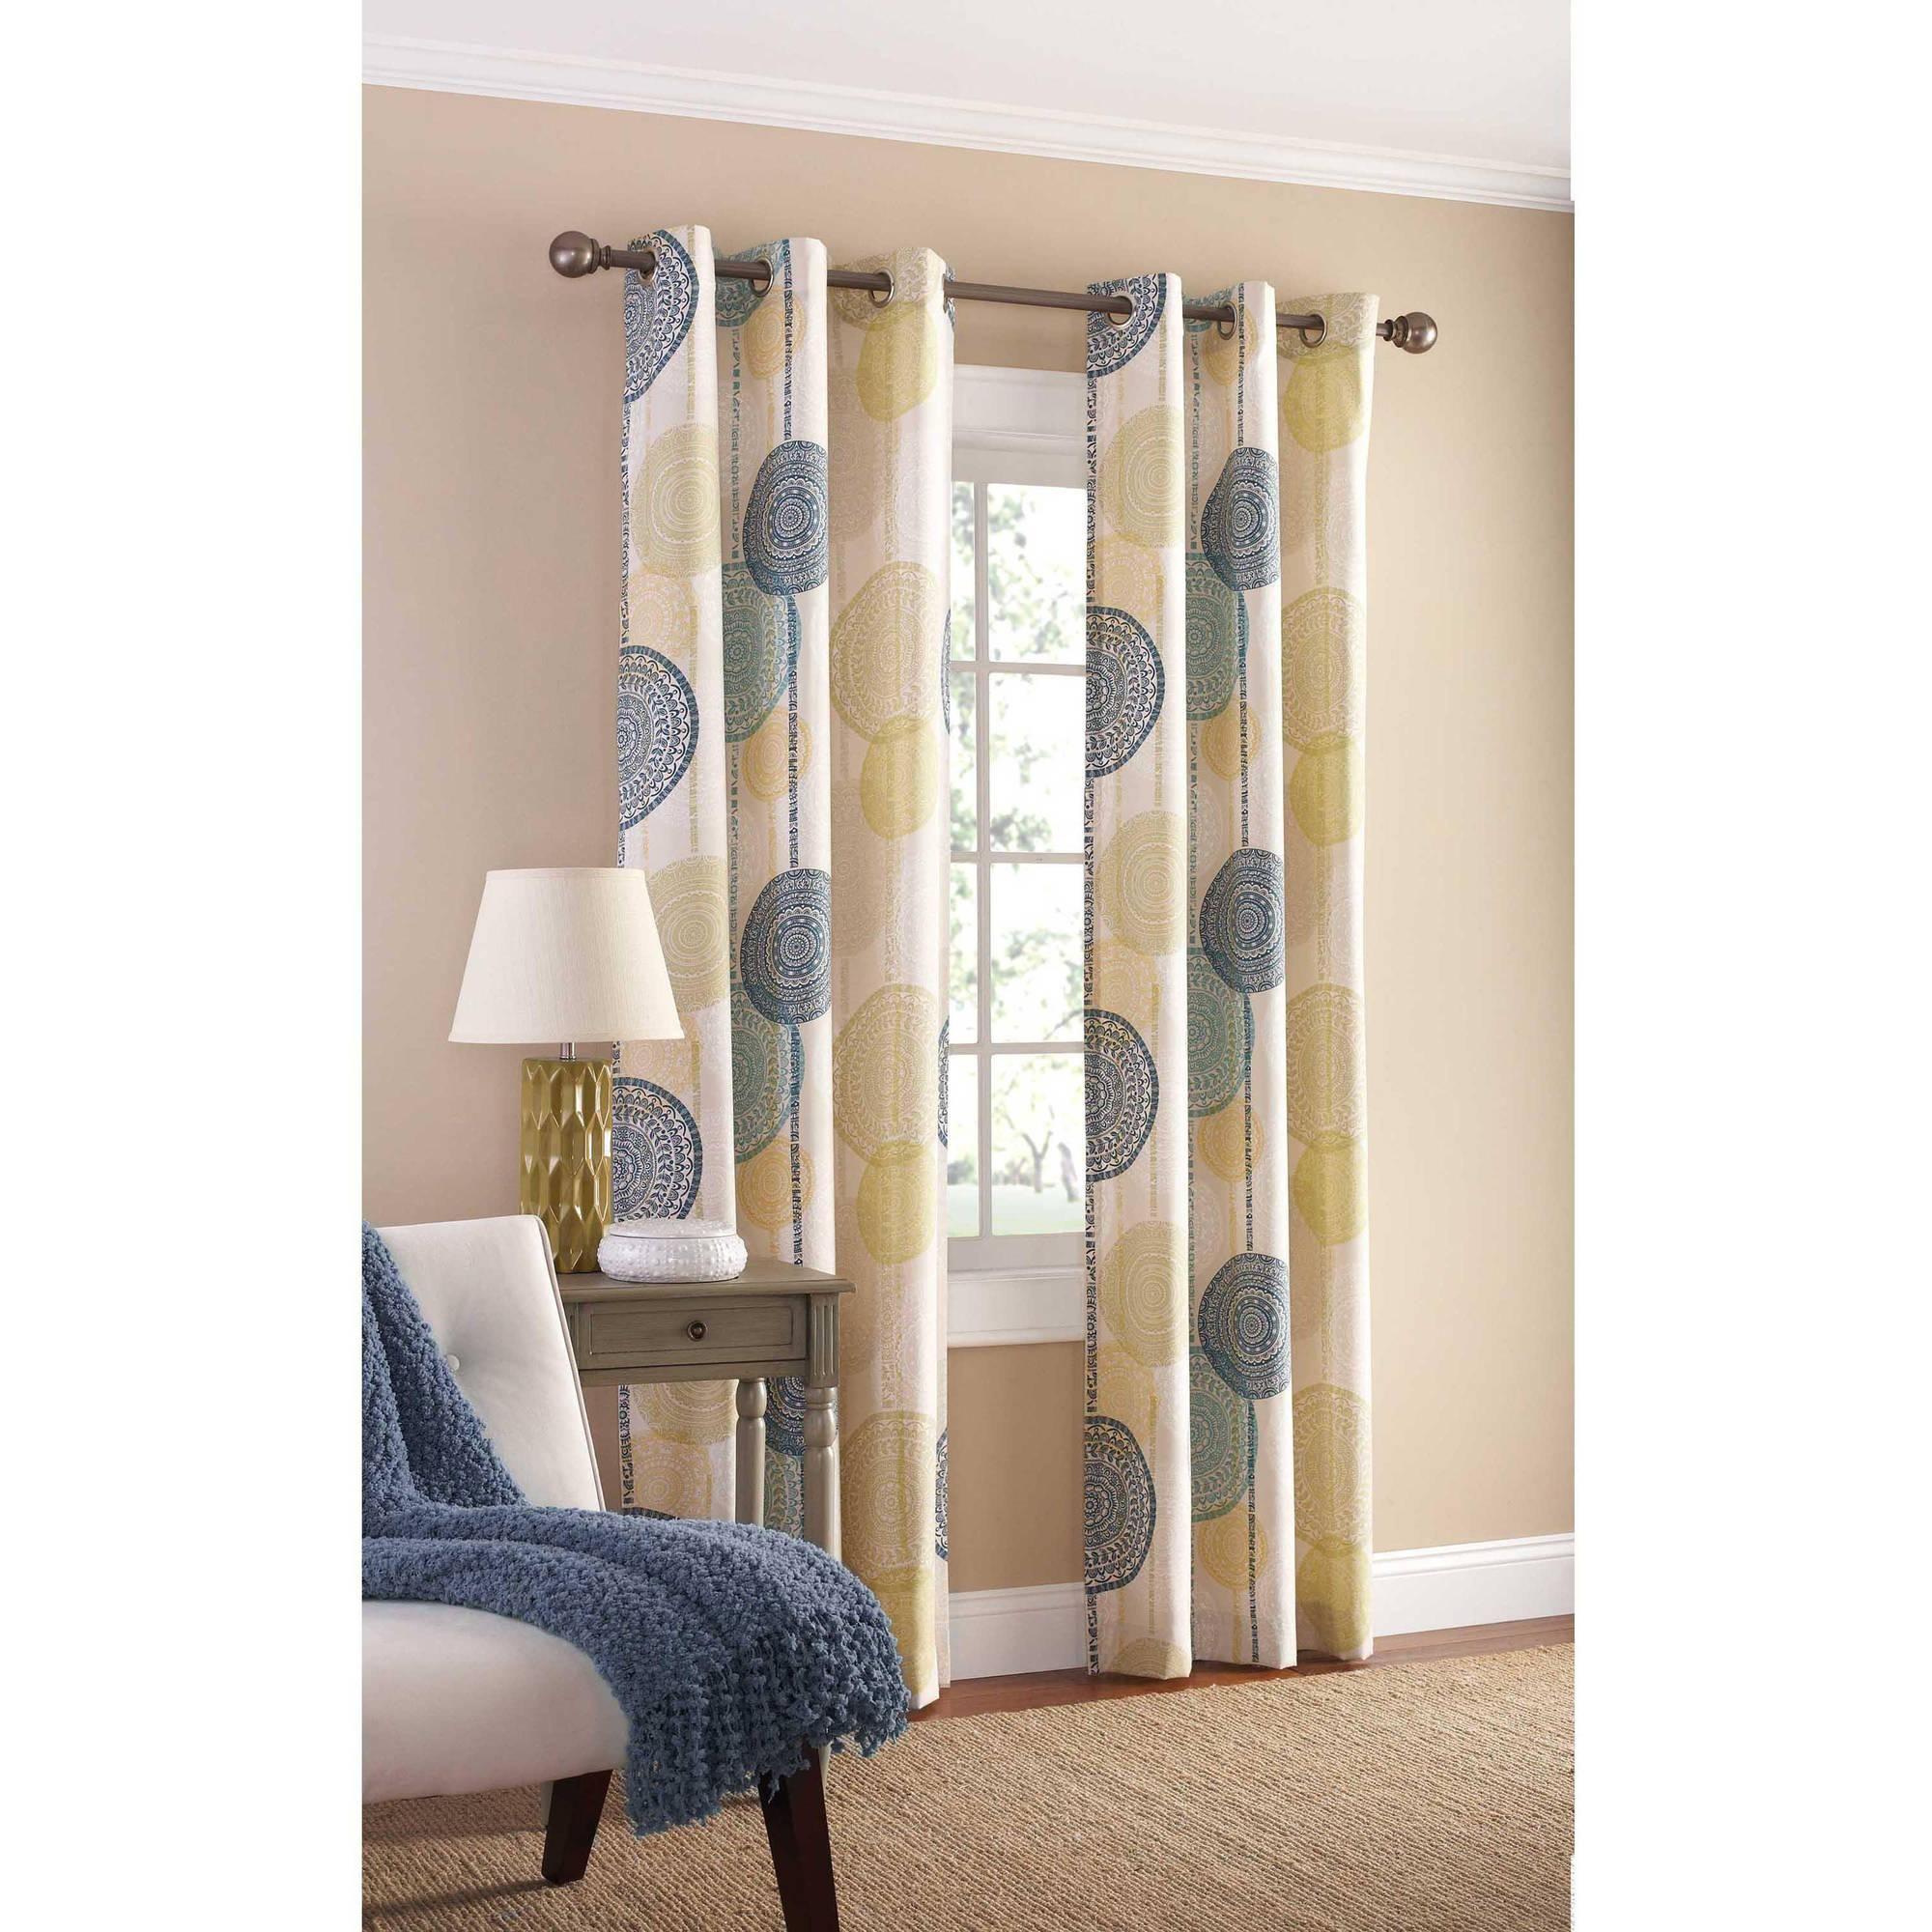 Mainstays Hanging Medallion Grommet Curtain Panels Set Of 2 80